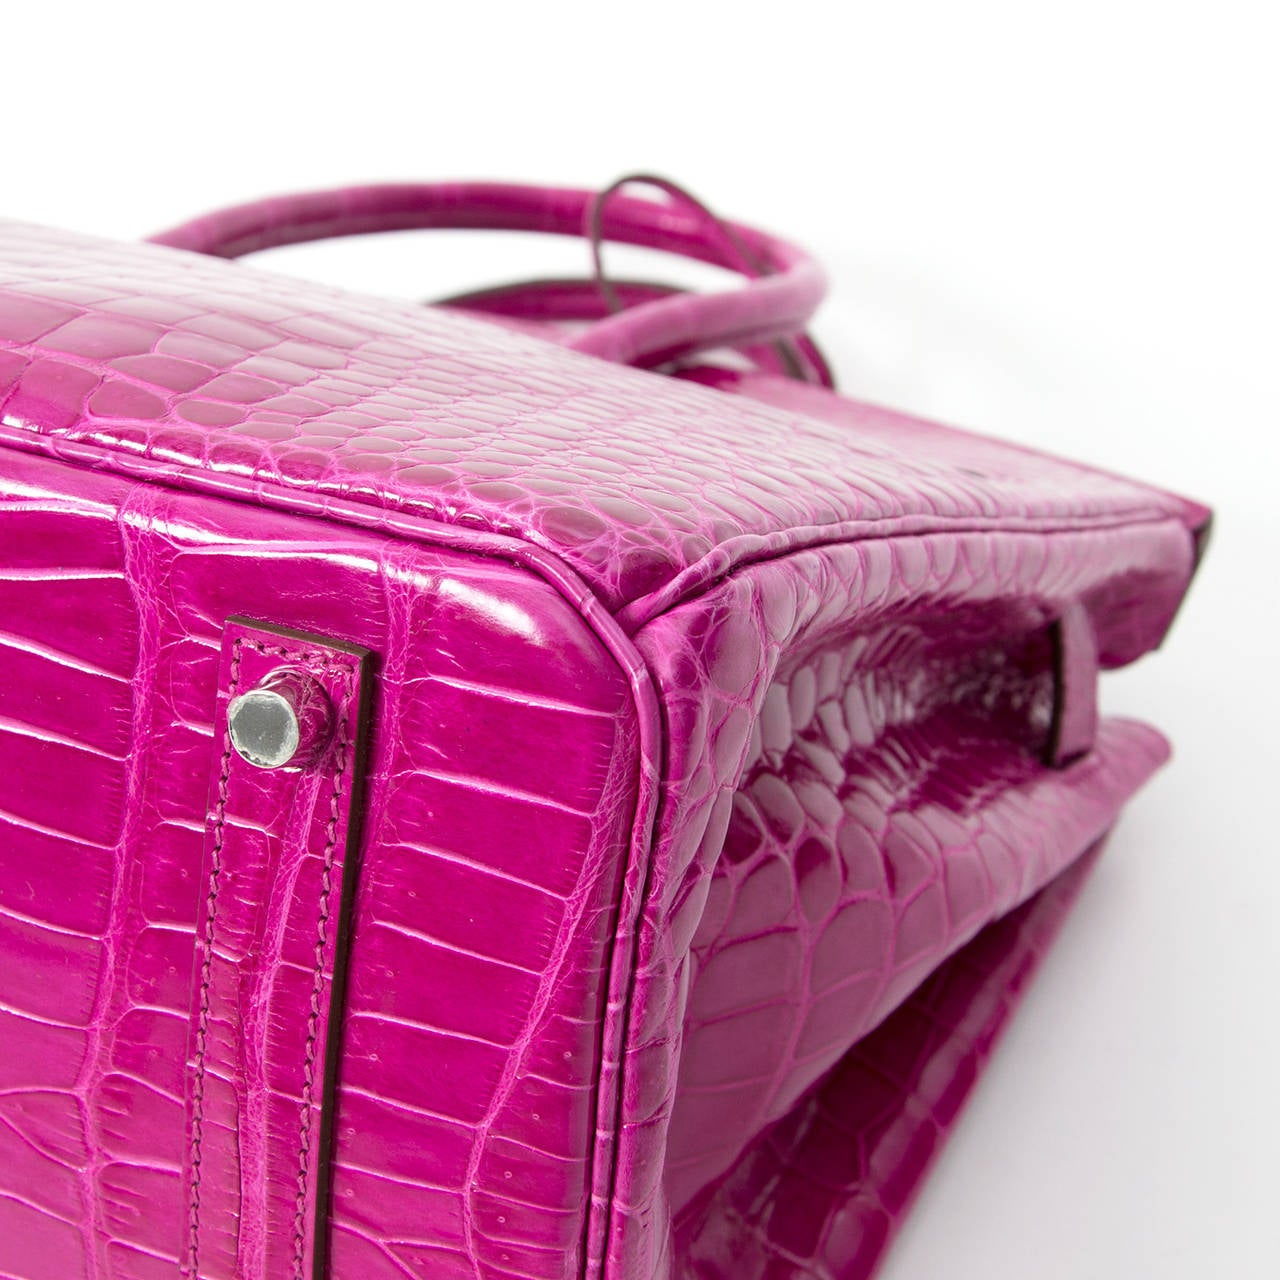 Hermès Birkin Corocodile Porosus PHW Rose Sheherazade 35 4